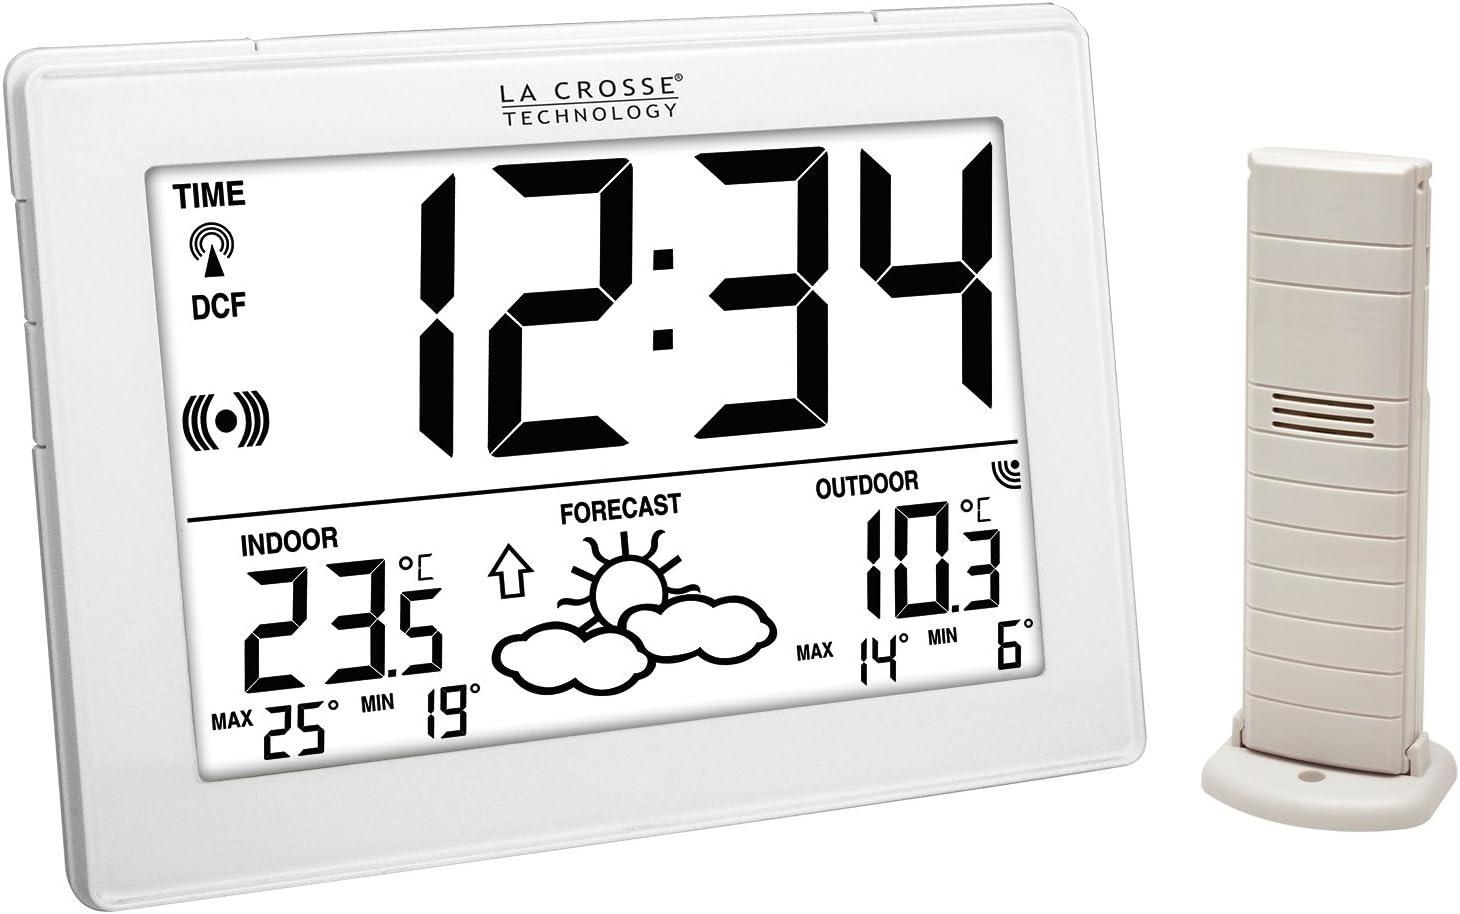 weather station temperatures interior//exterior La Crosse Technology WS9180 white